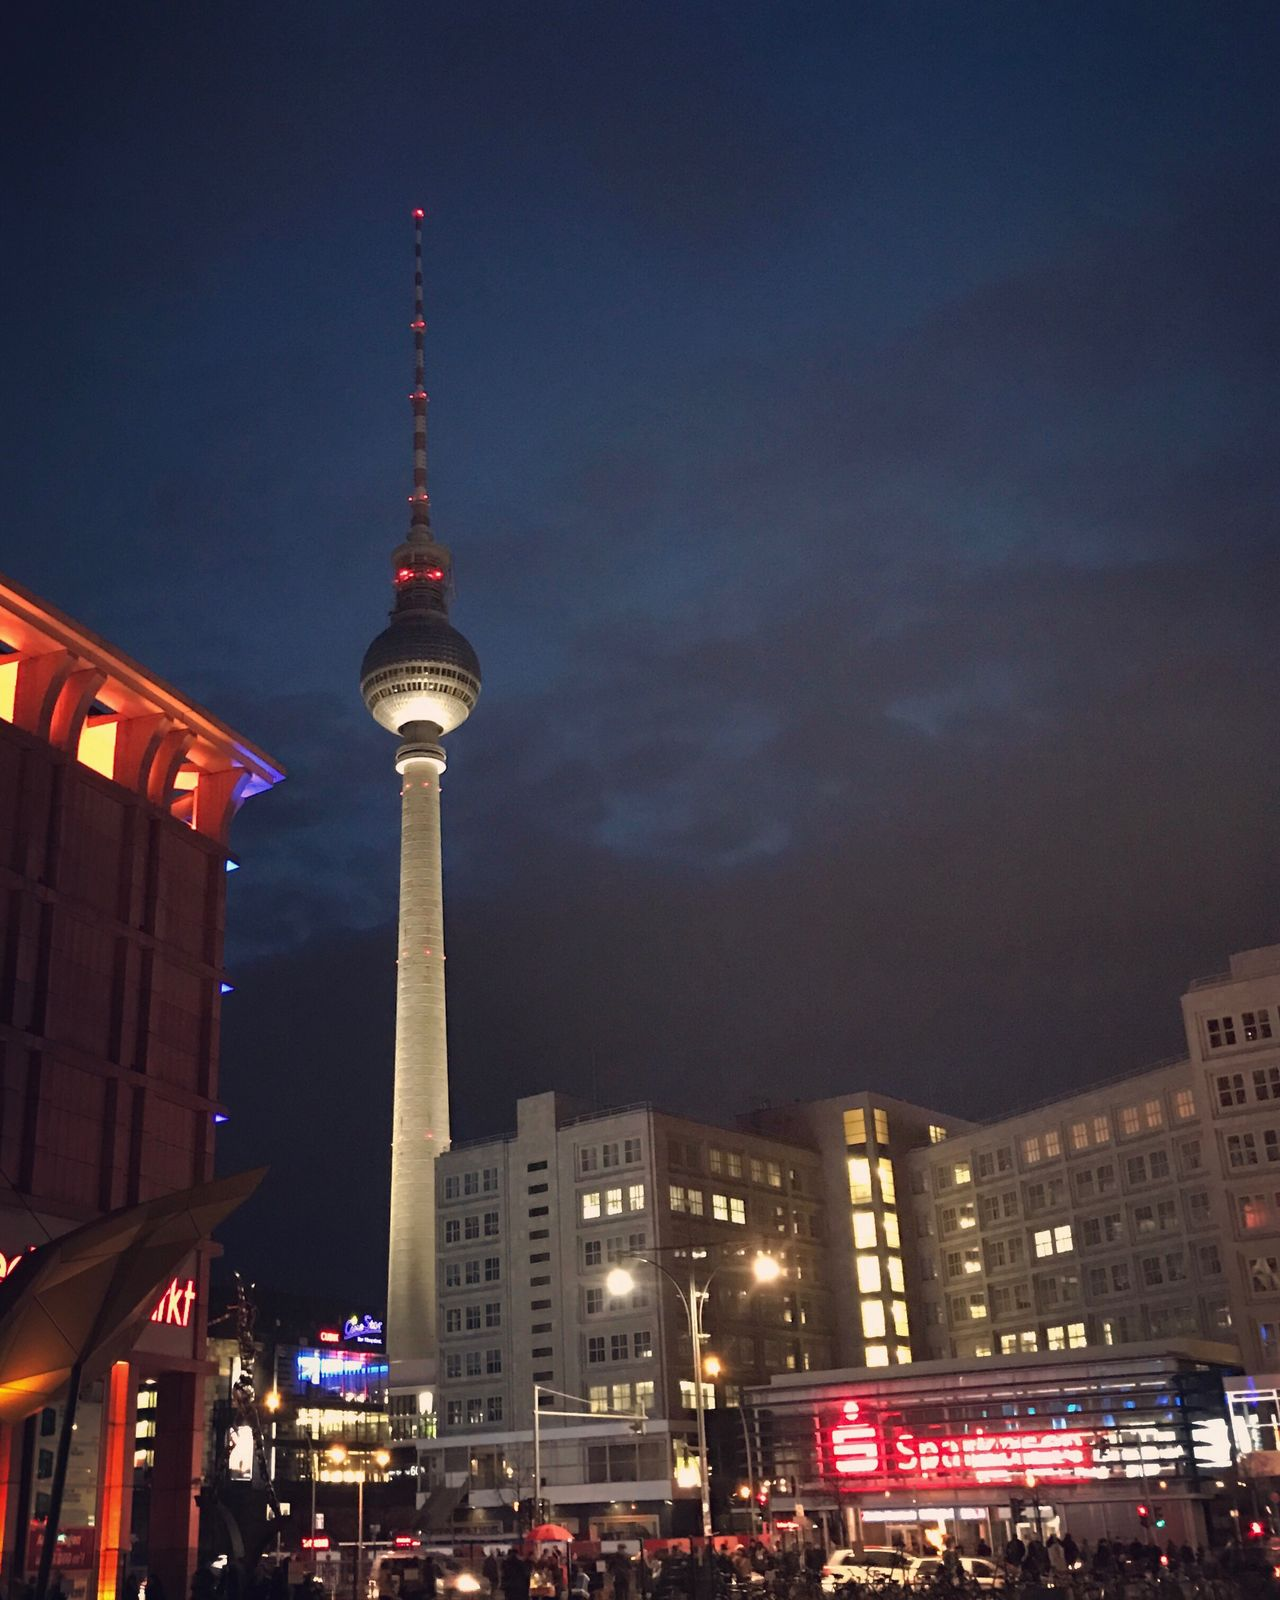 Night Lights Night Lights Colors City Urban Fernsehturm Tower Berlin